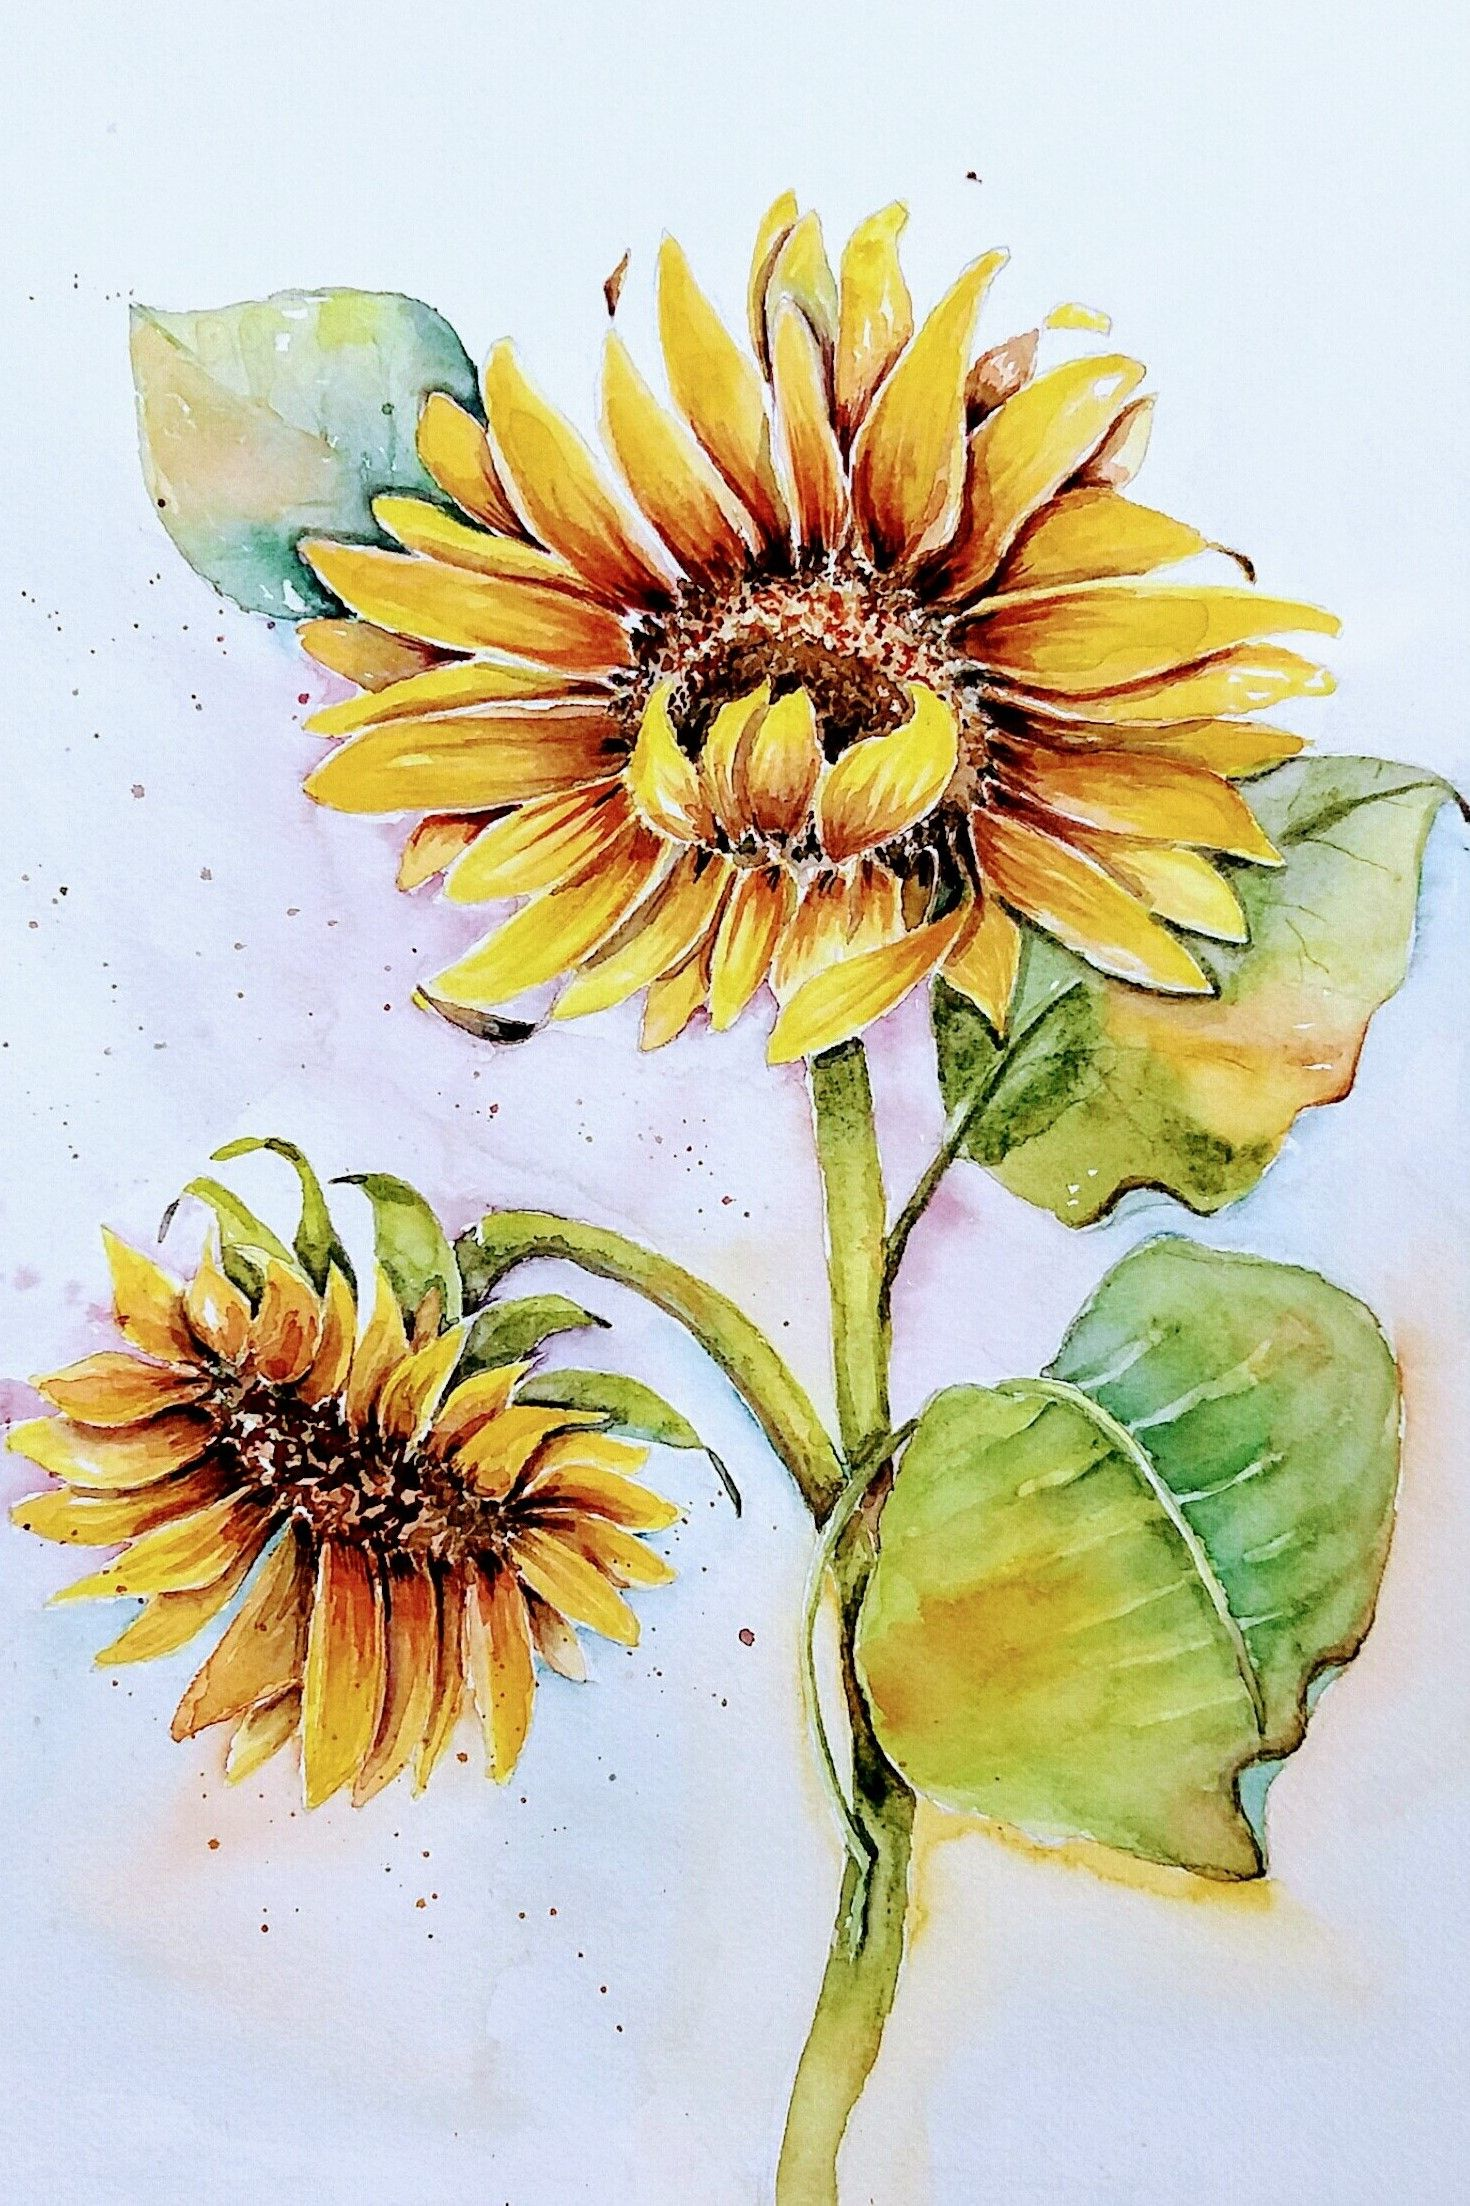 Aquarell Sonnenblume Watercolor Sunflower Aquarell Sonnenblumen